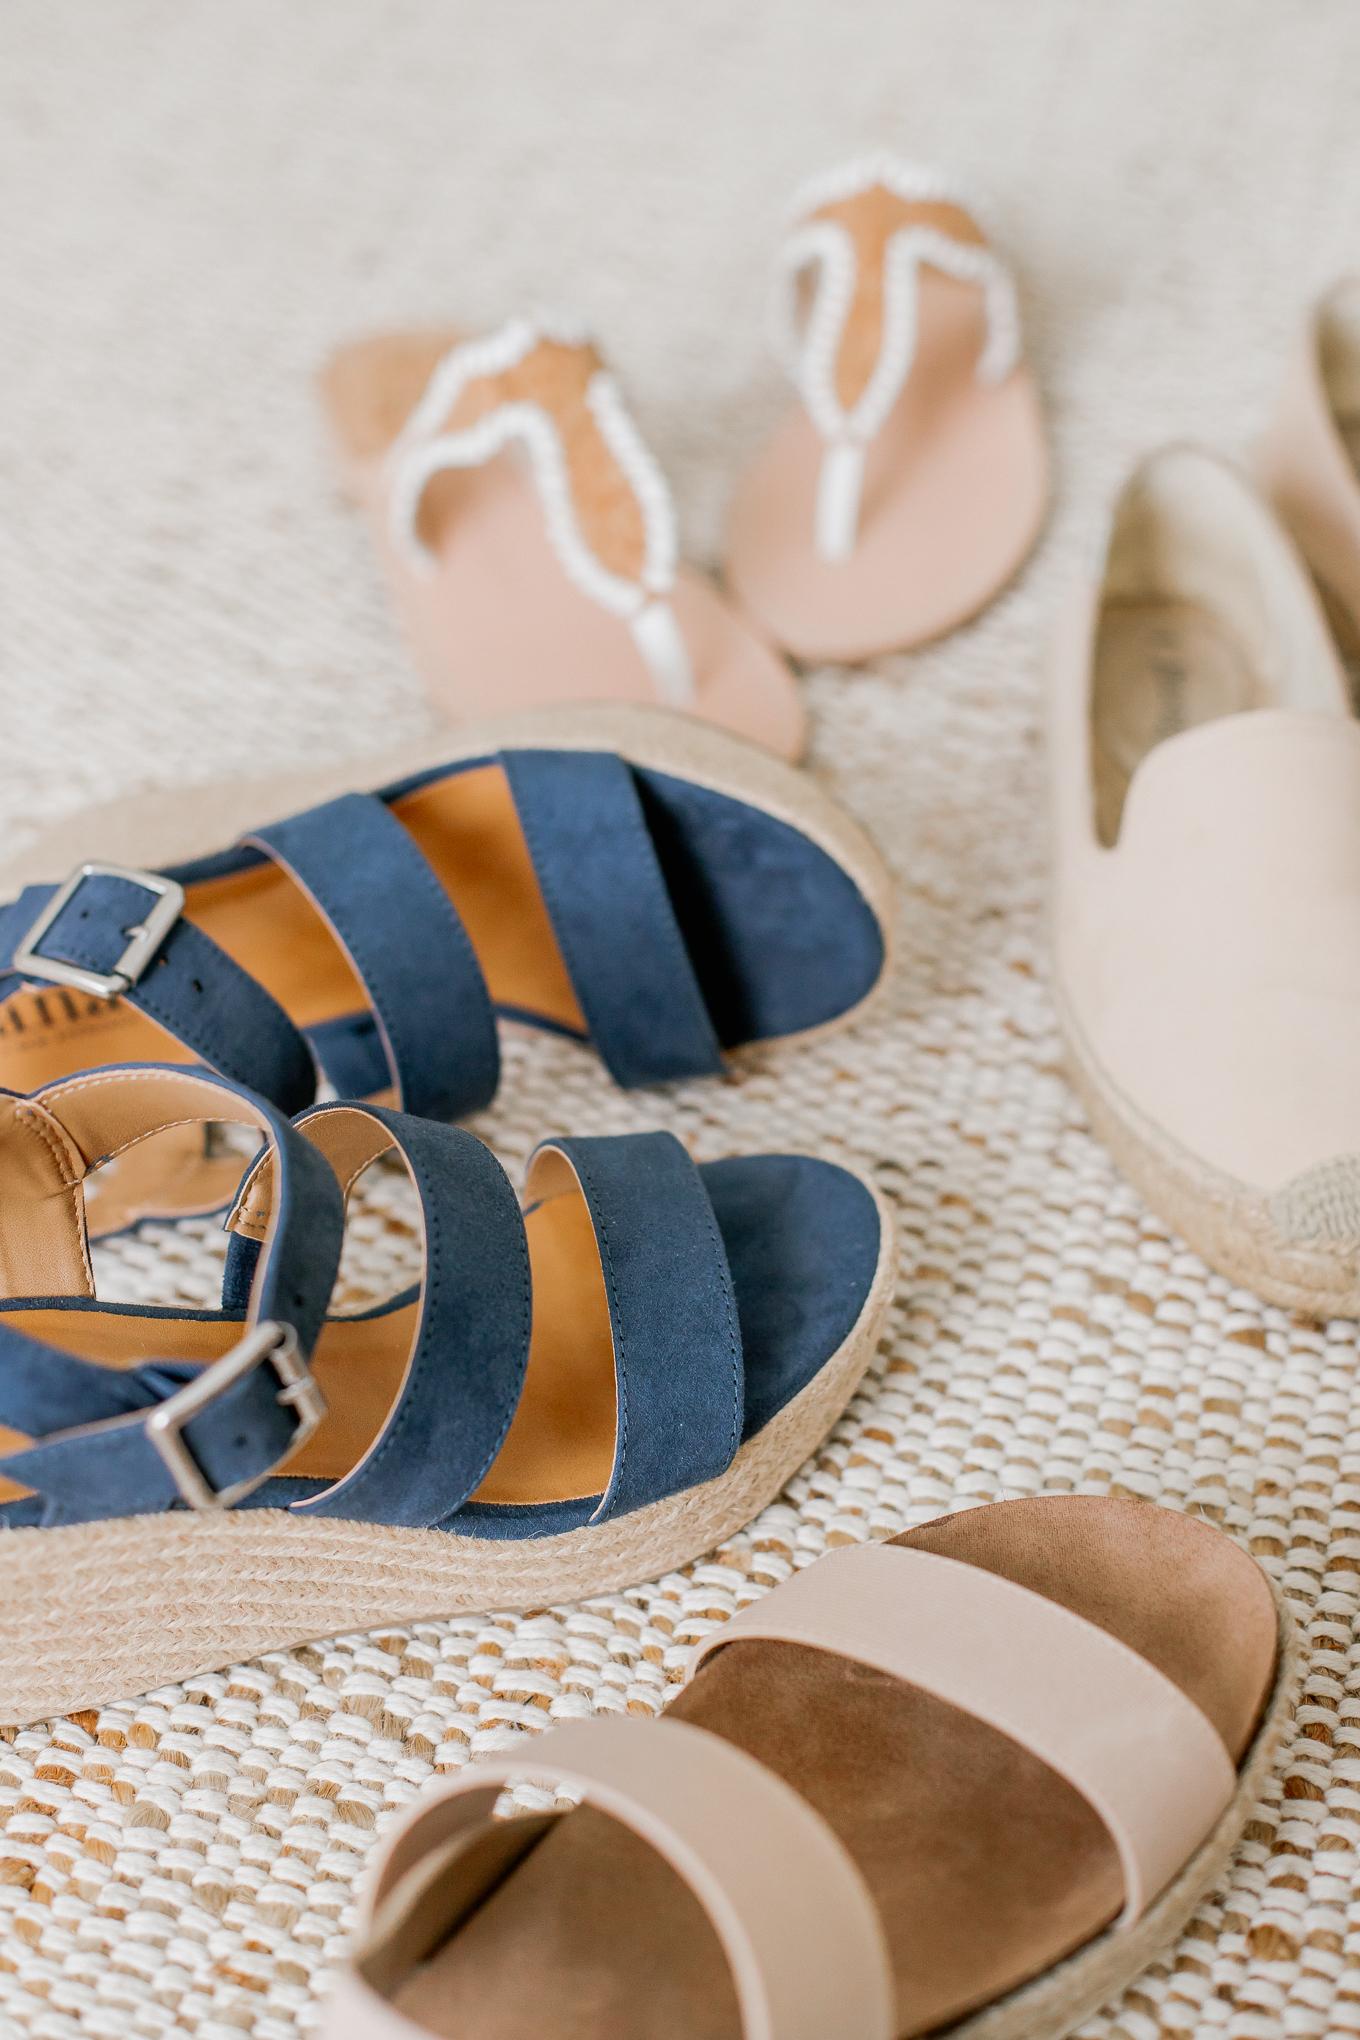 Blue Espadrille Wedges, Jack Rogers Jackie Sandals, Neutral Spring Shoes   Louella Reese